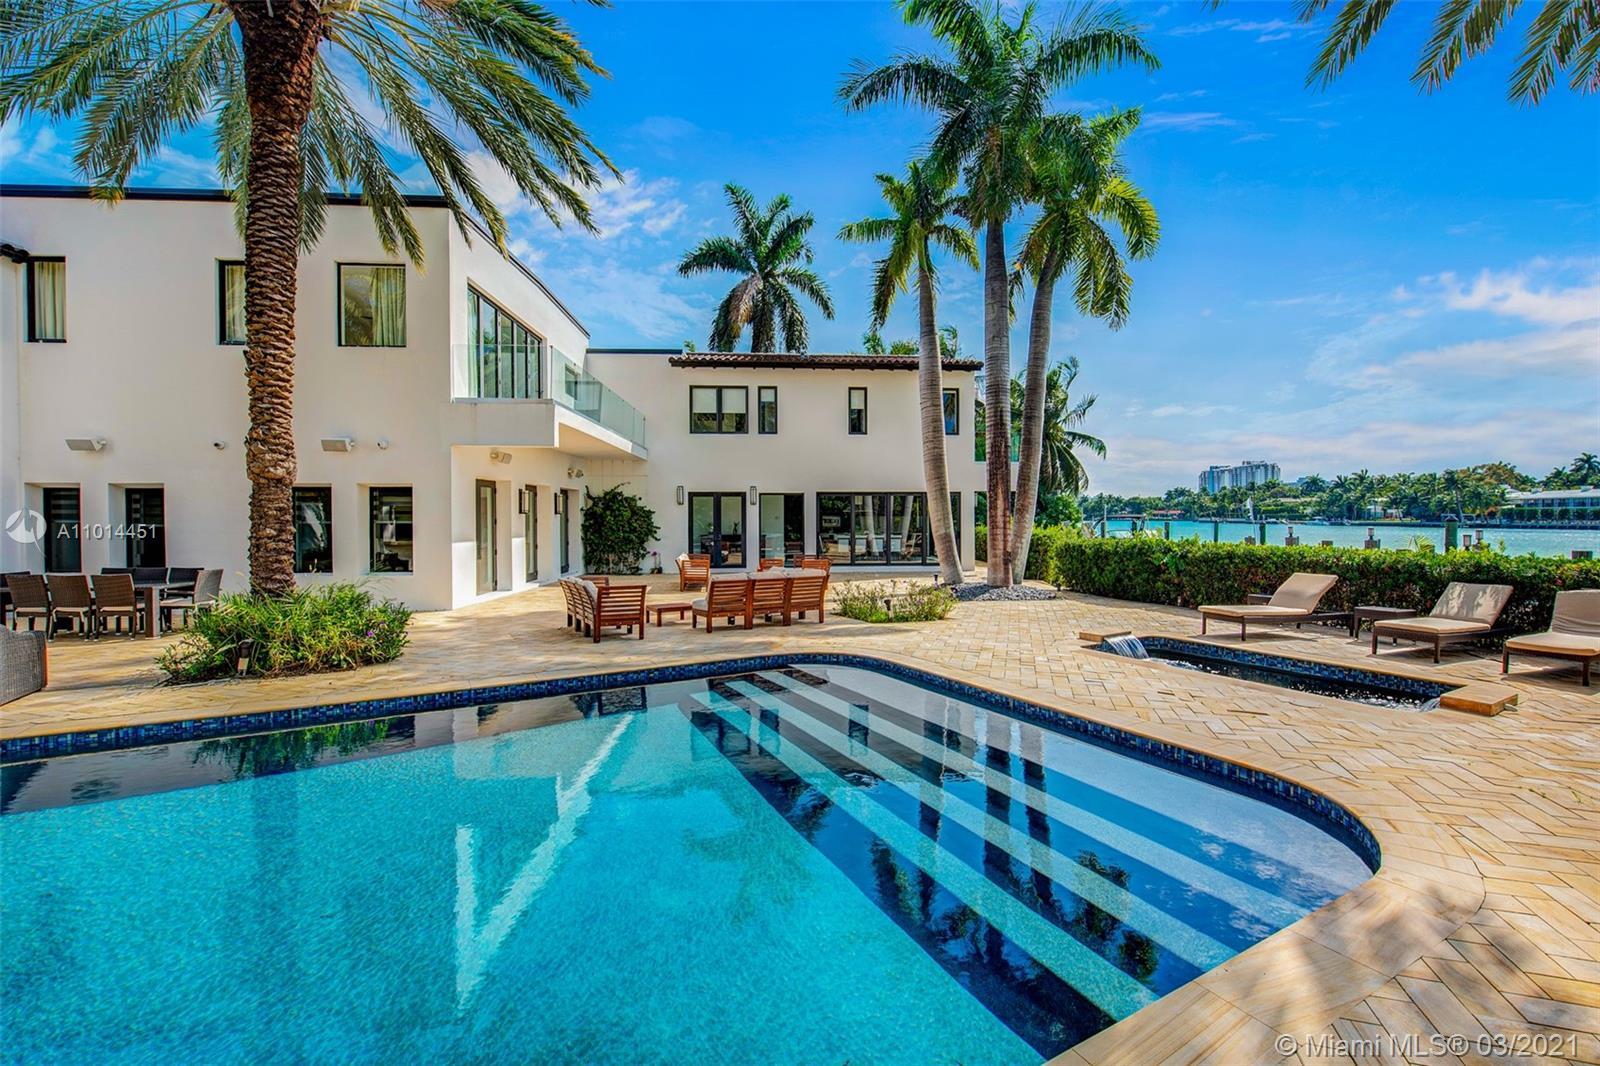 Sunset Lake #* - 2700 N Bay Rd #*, Miami Beach, FL 33140